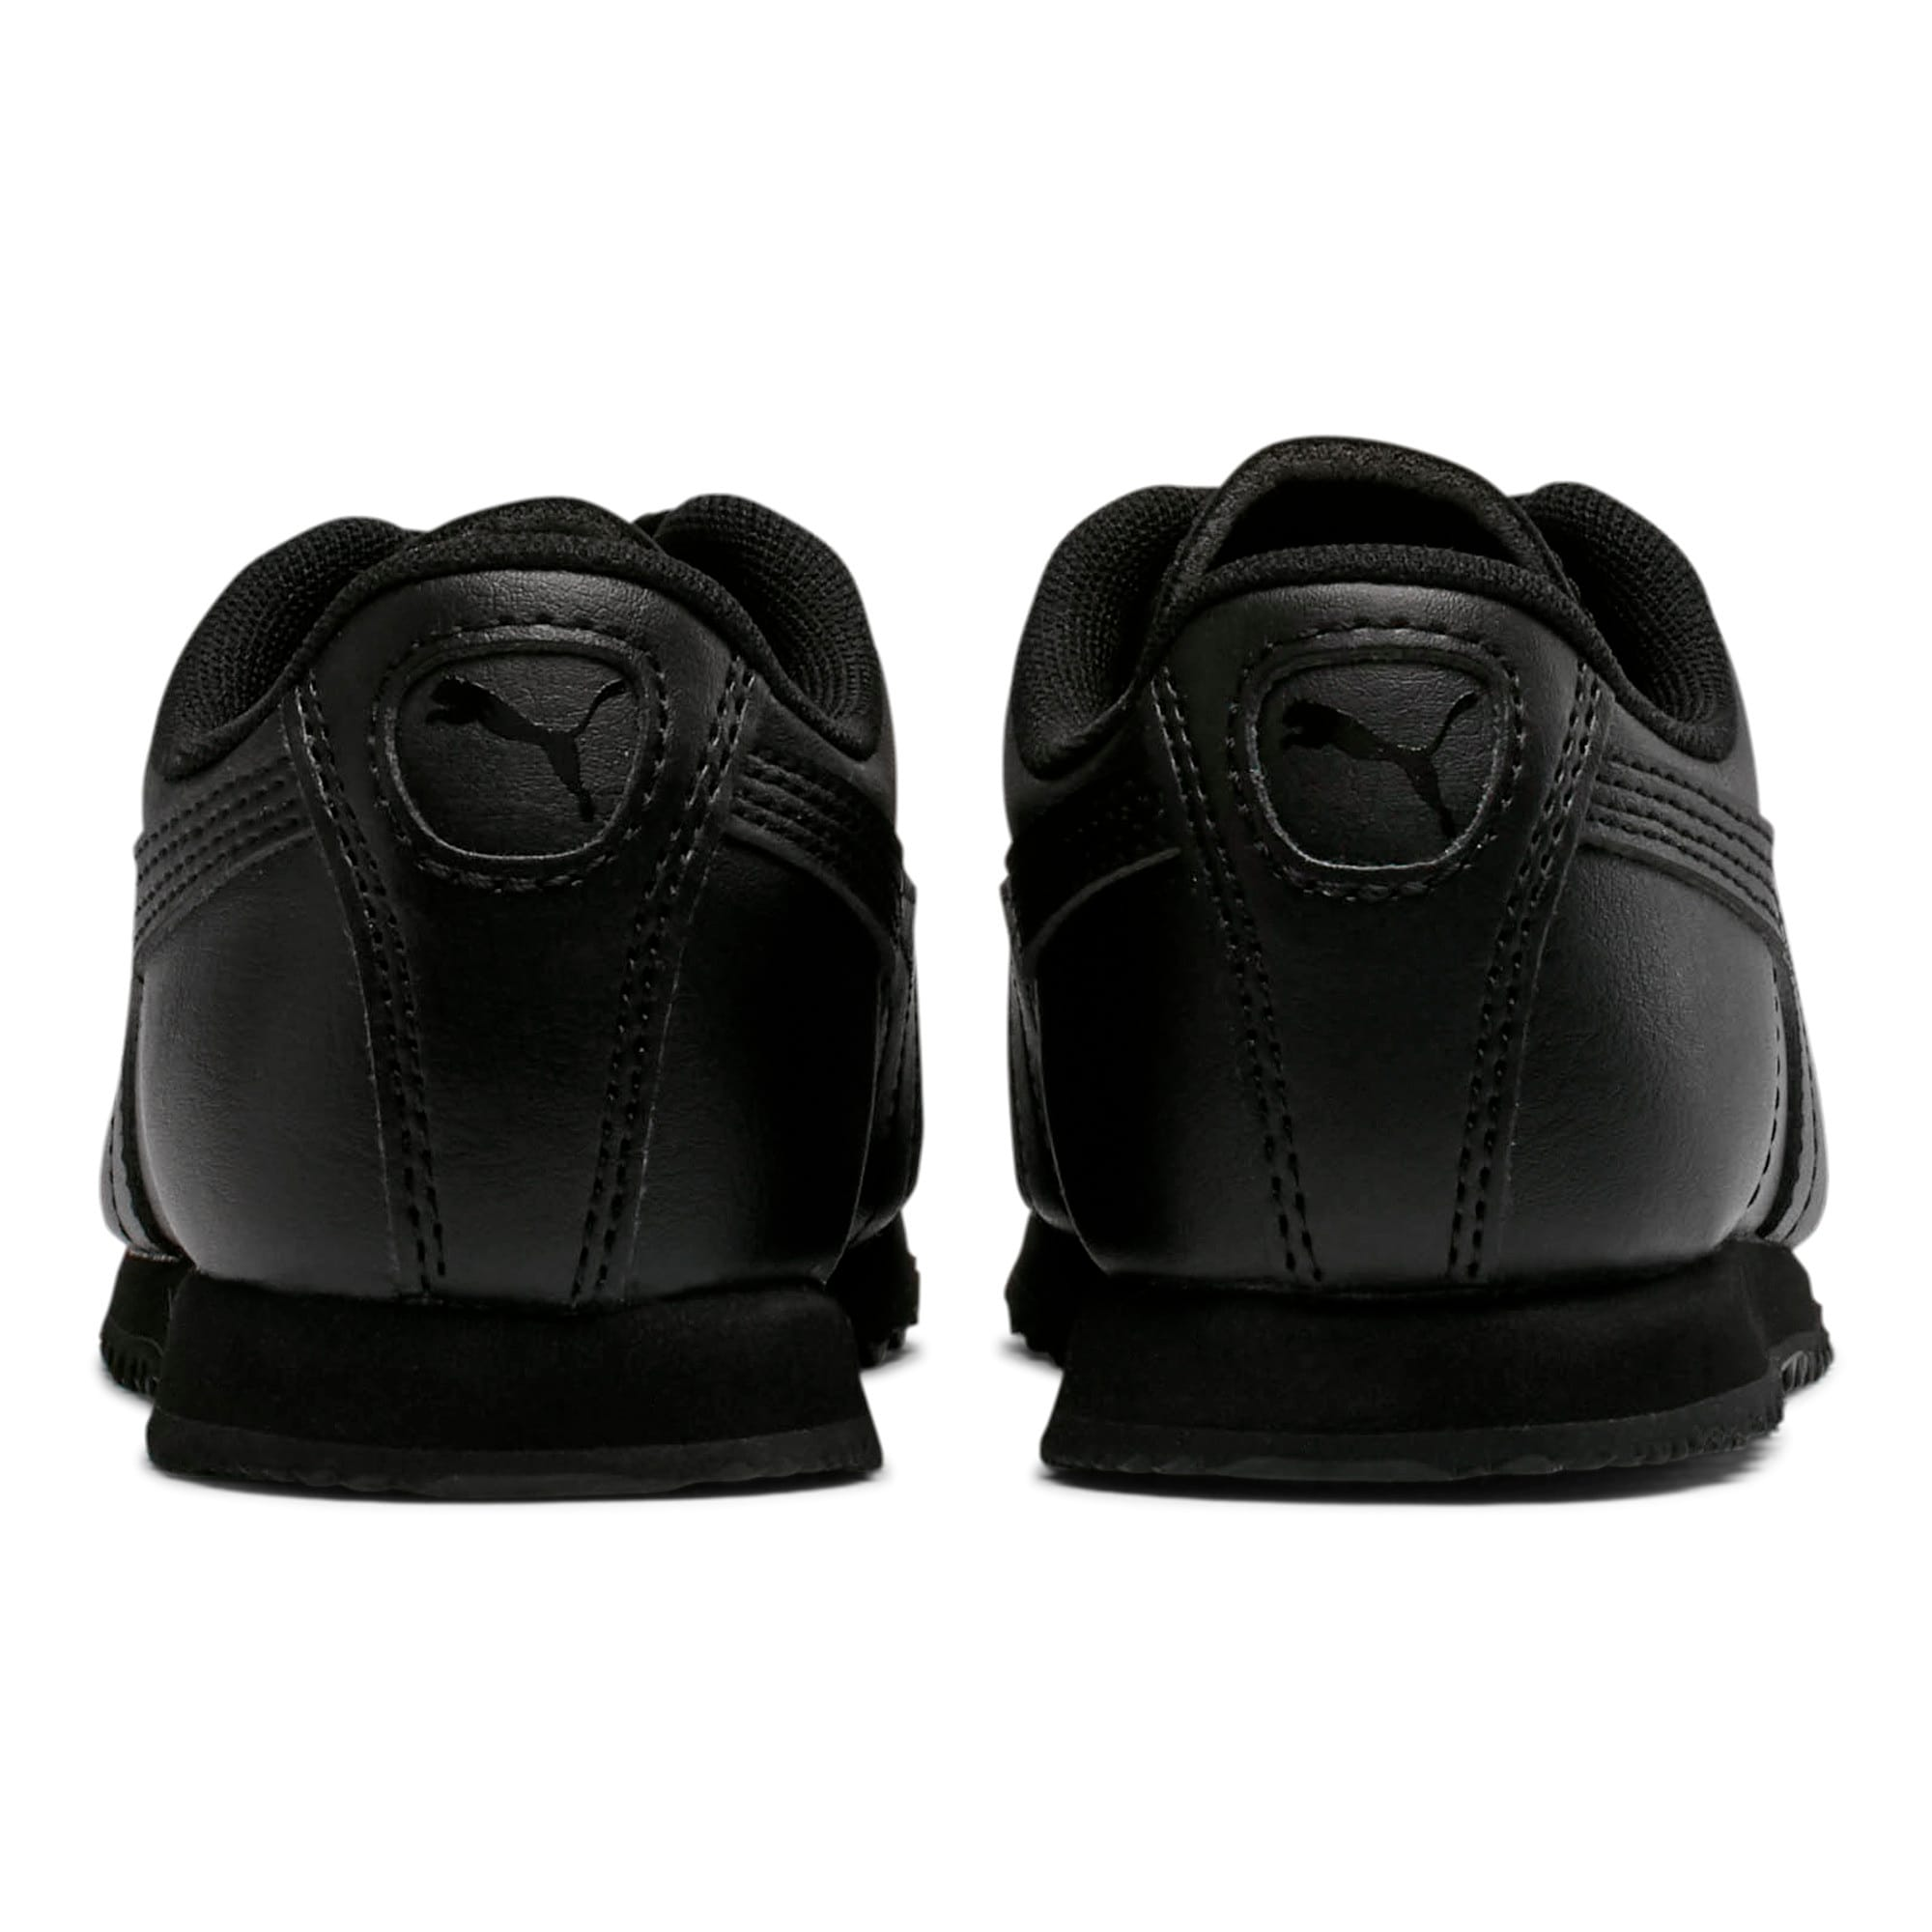 Thumbnail 3 of Roma Basic Little Kids' Shoes, Puma Black-Puma Black, medium